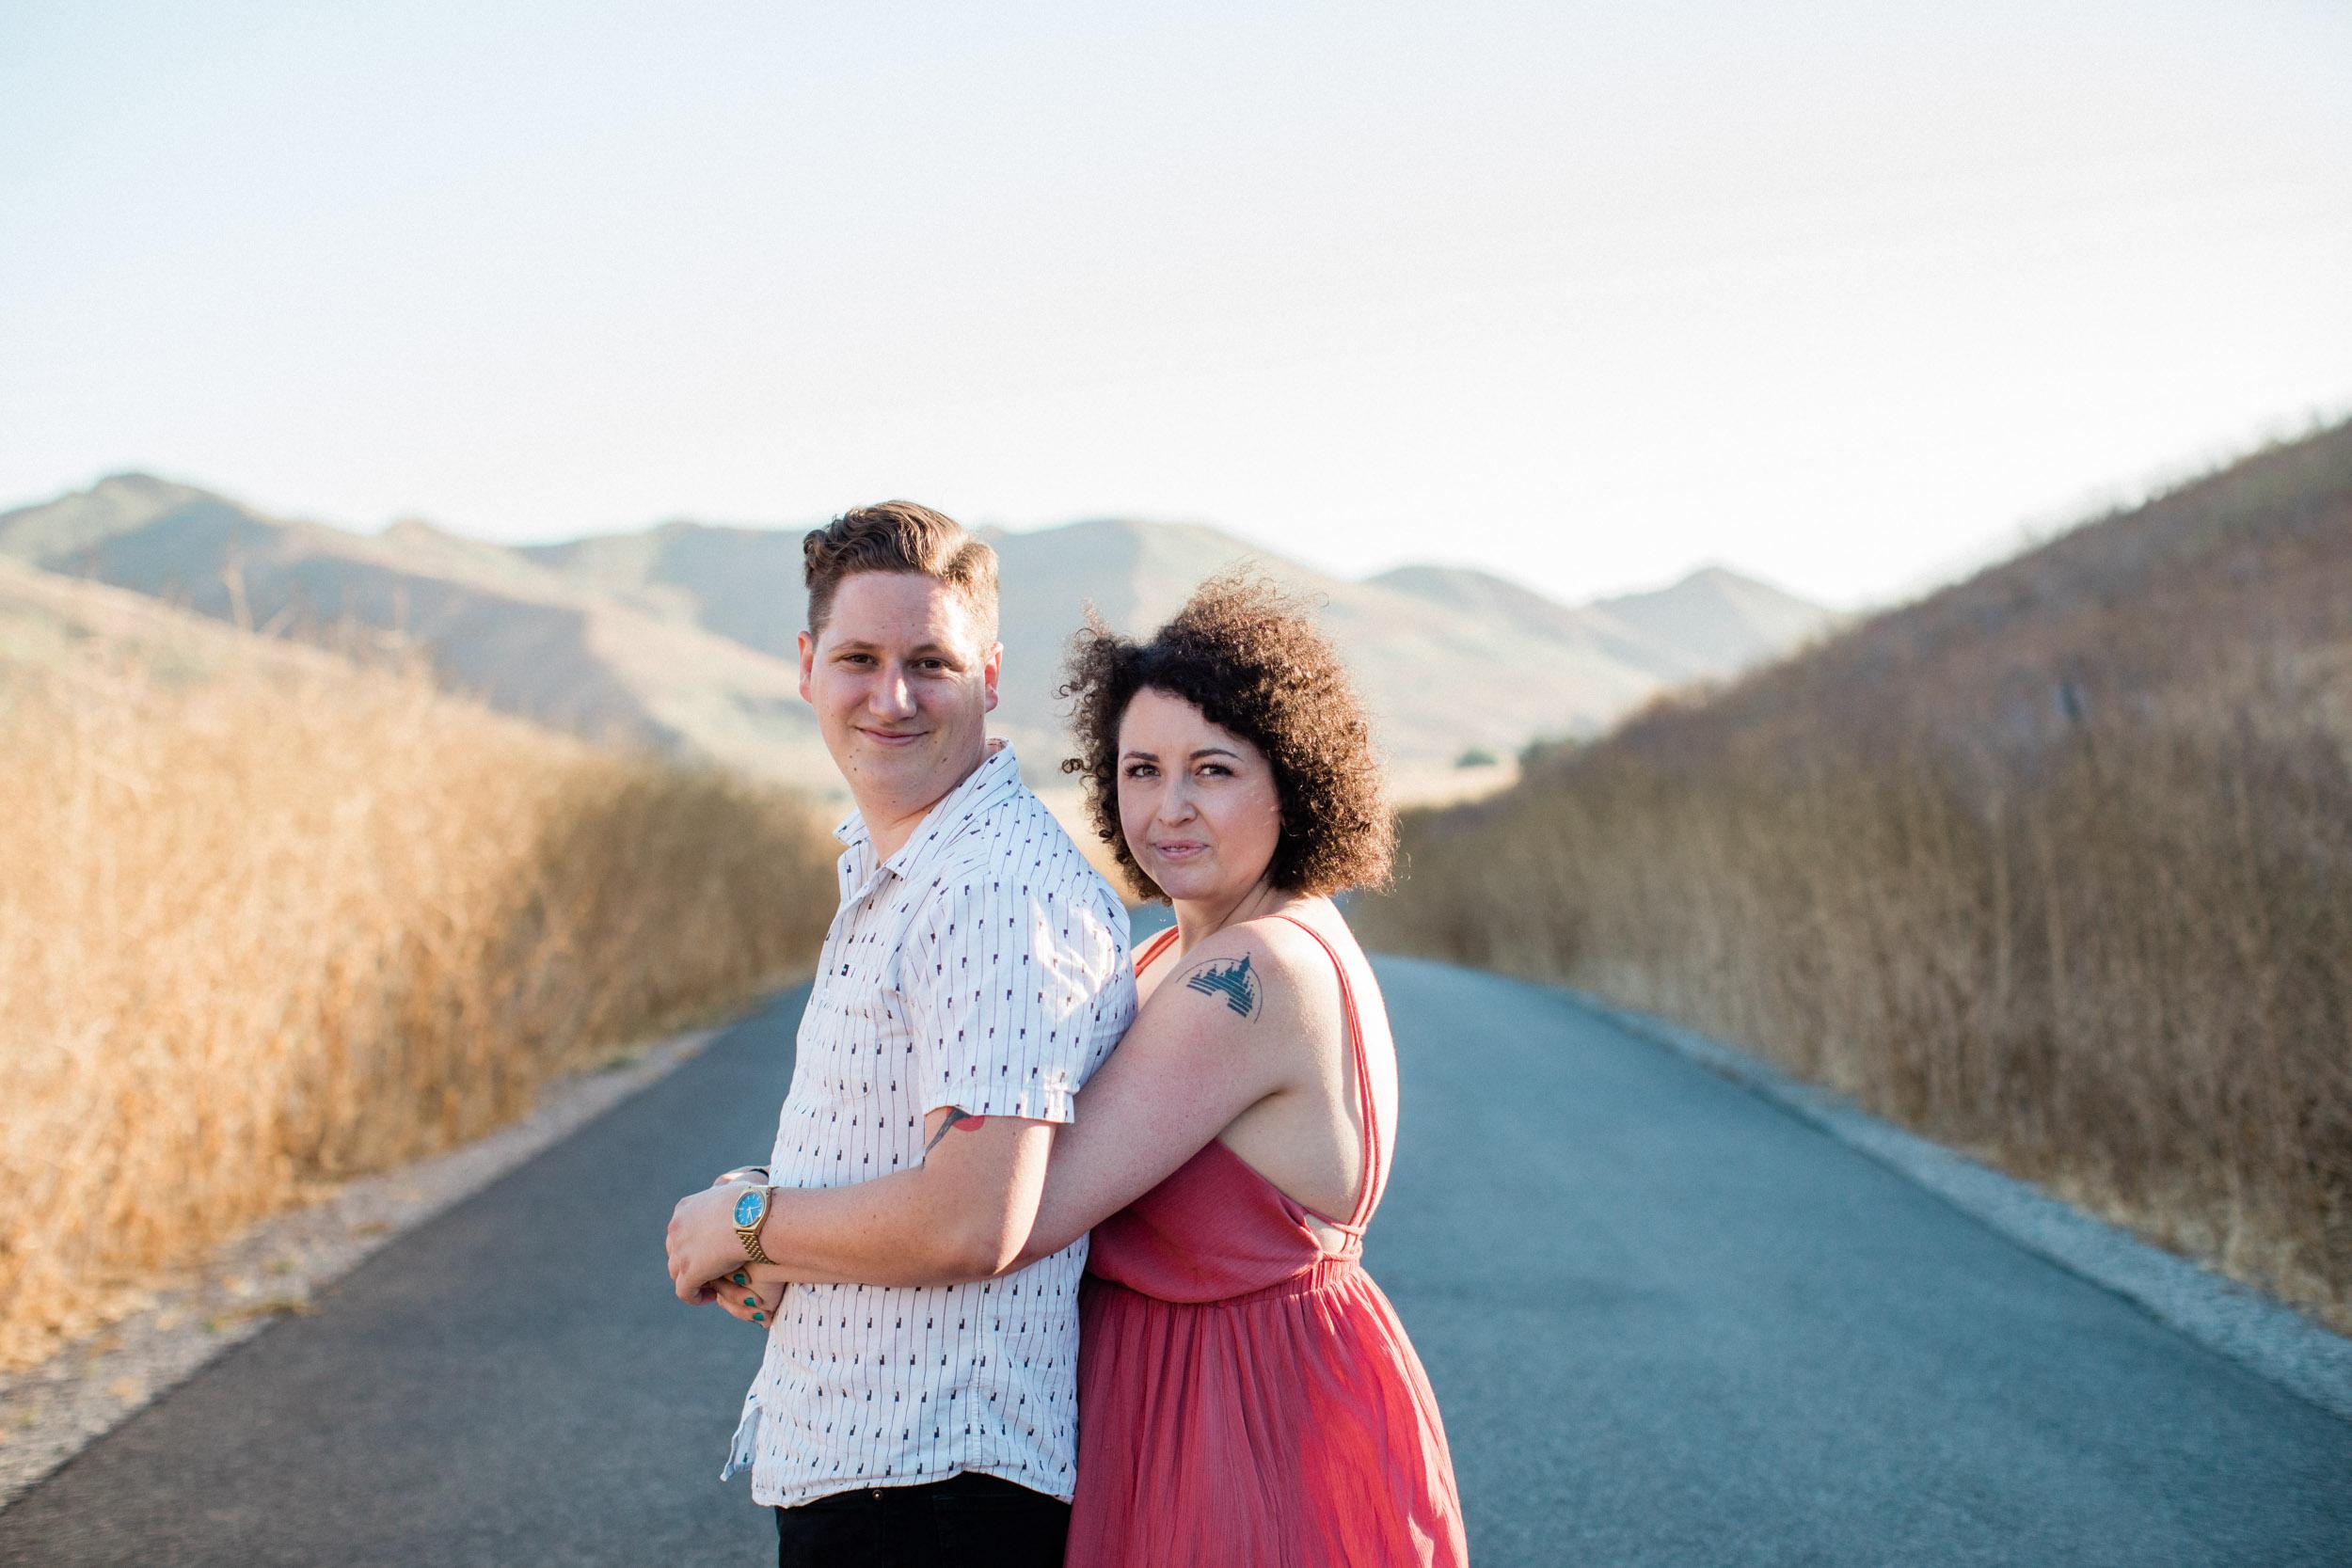 BKM-Photography-Ventura-Southern-California-Engagement-Wedding-0023.jpg